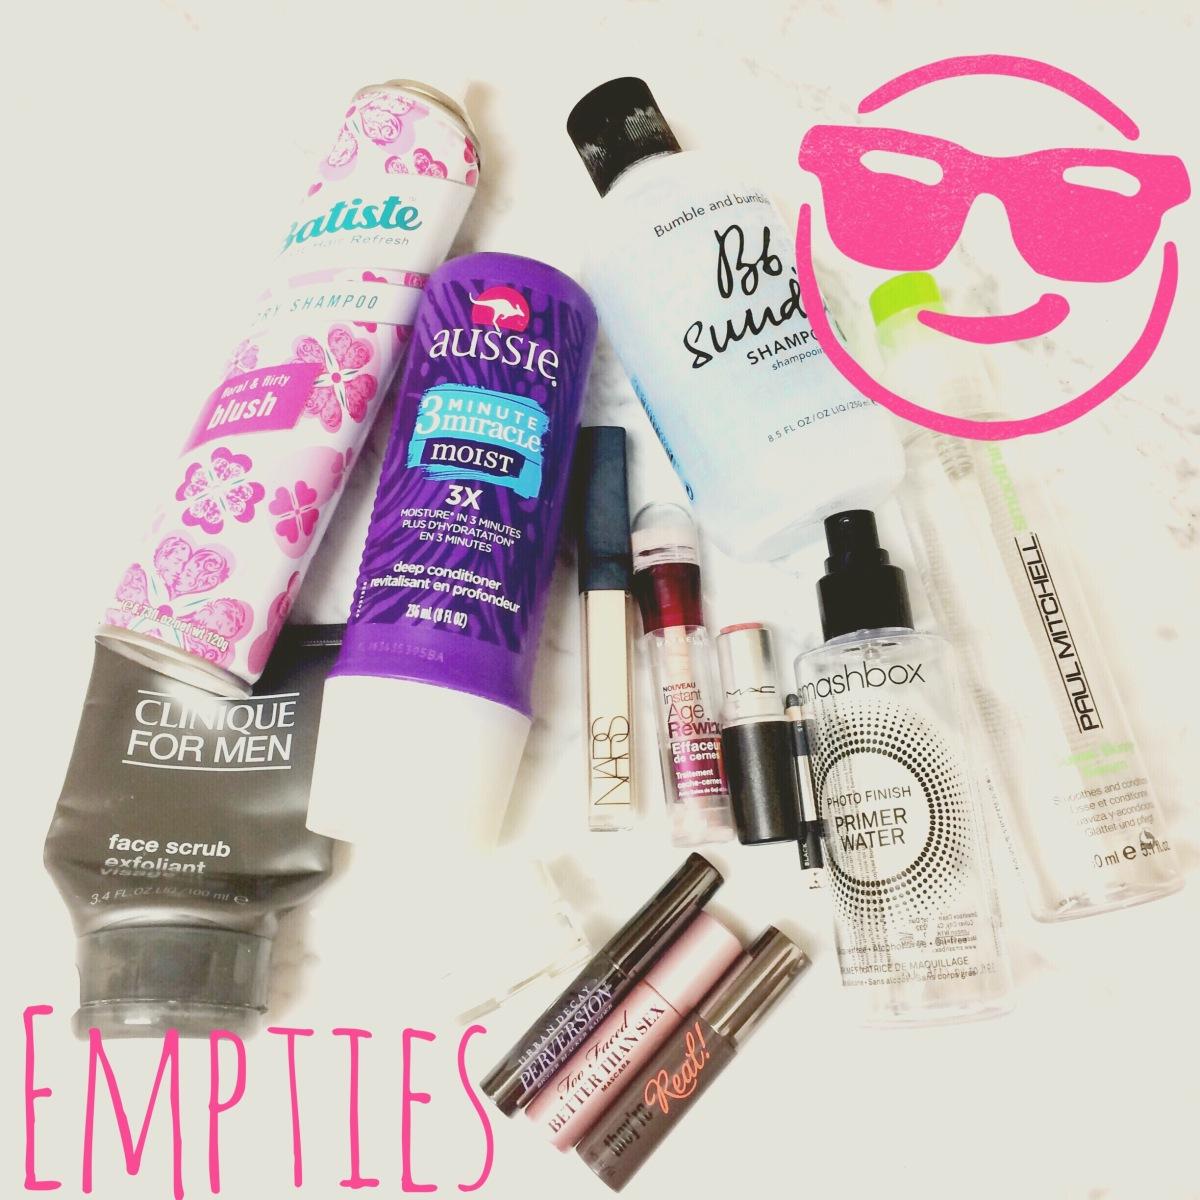 Quarterly EMPTIES | Products I've UsedUp